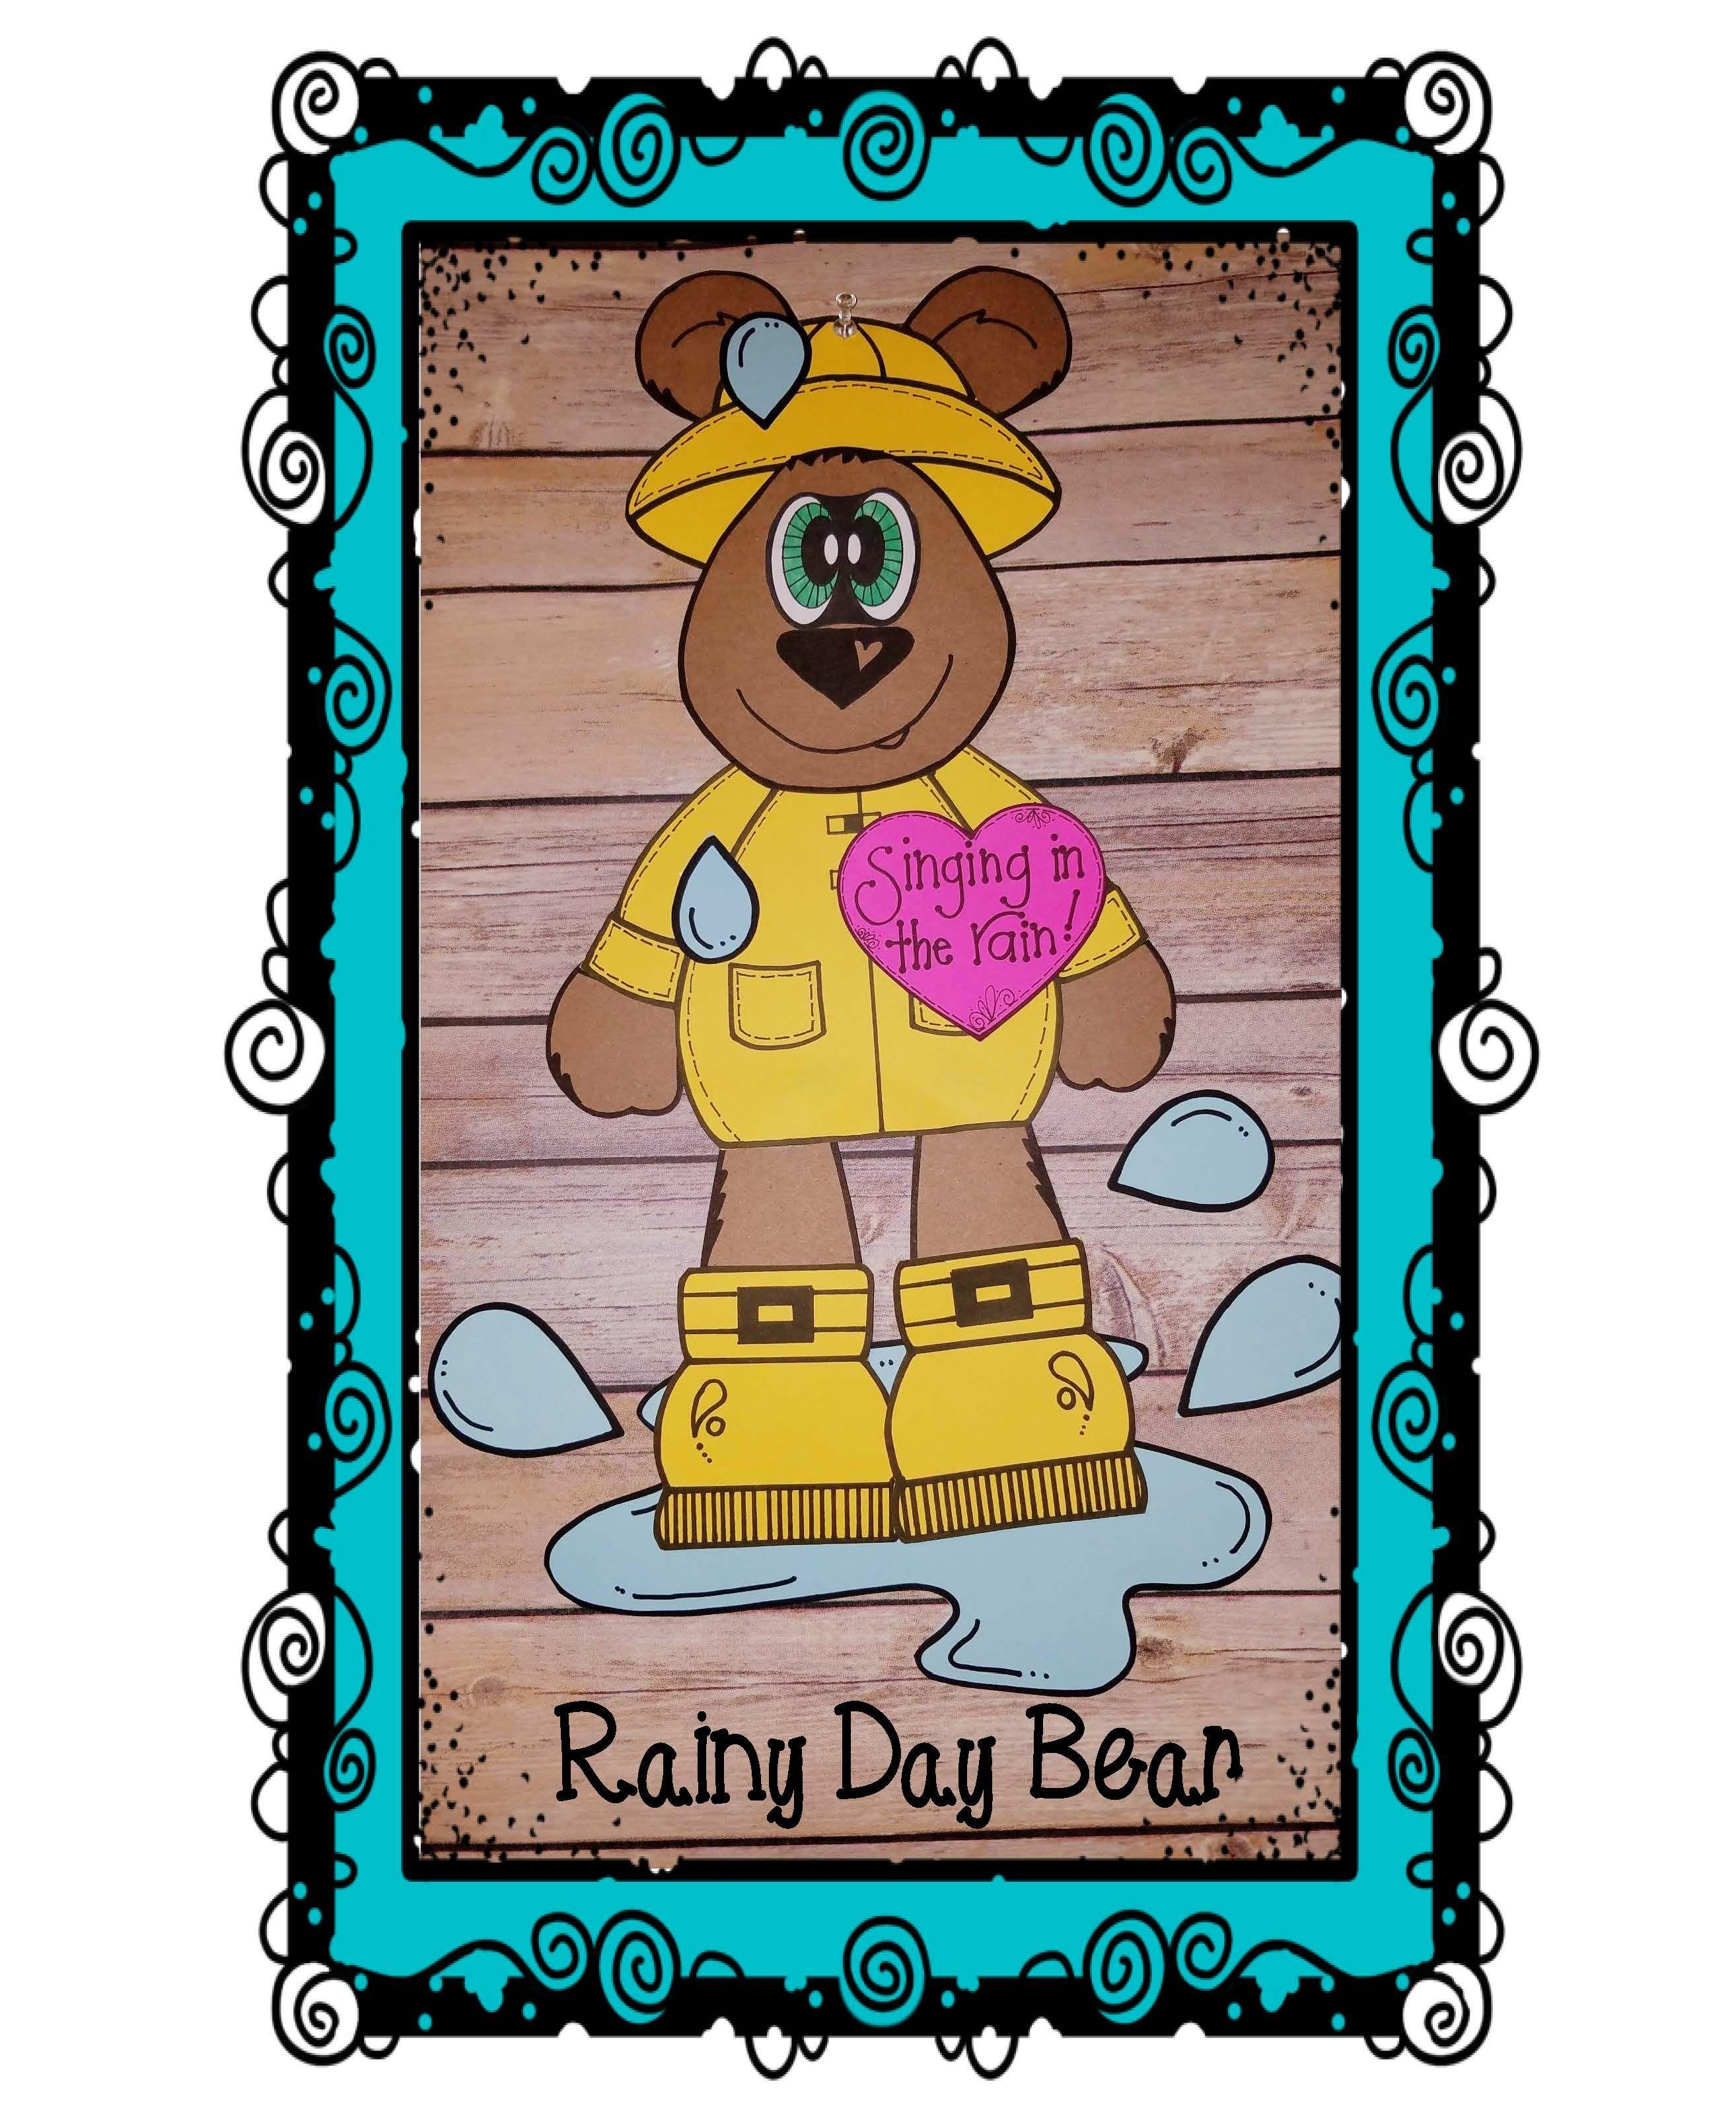 Spring Craft Rainy Day Bear Craft